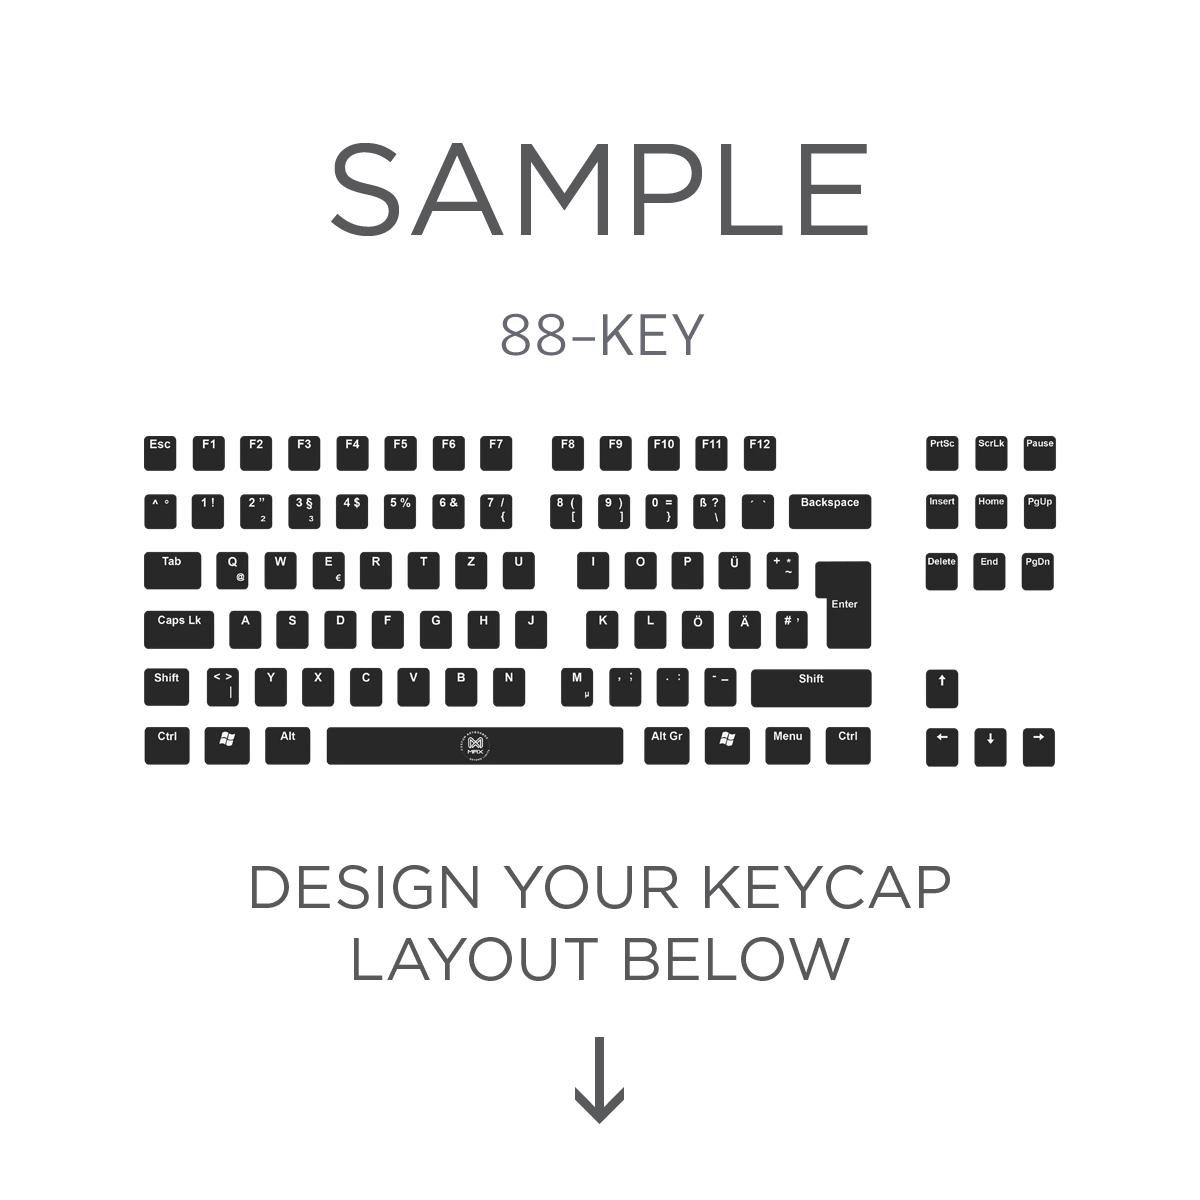 88 key piano keyboard diagram pourbaix copper max iso layout custom backlight cherry mx keycap set top